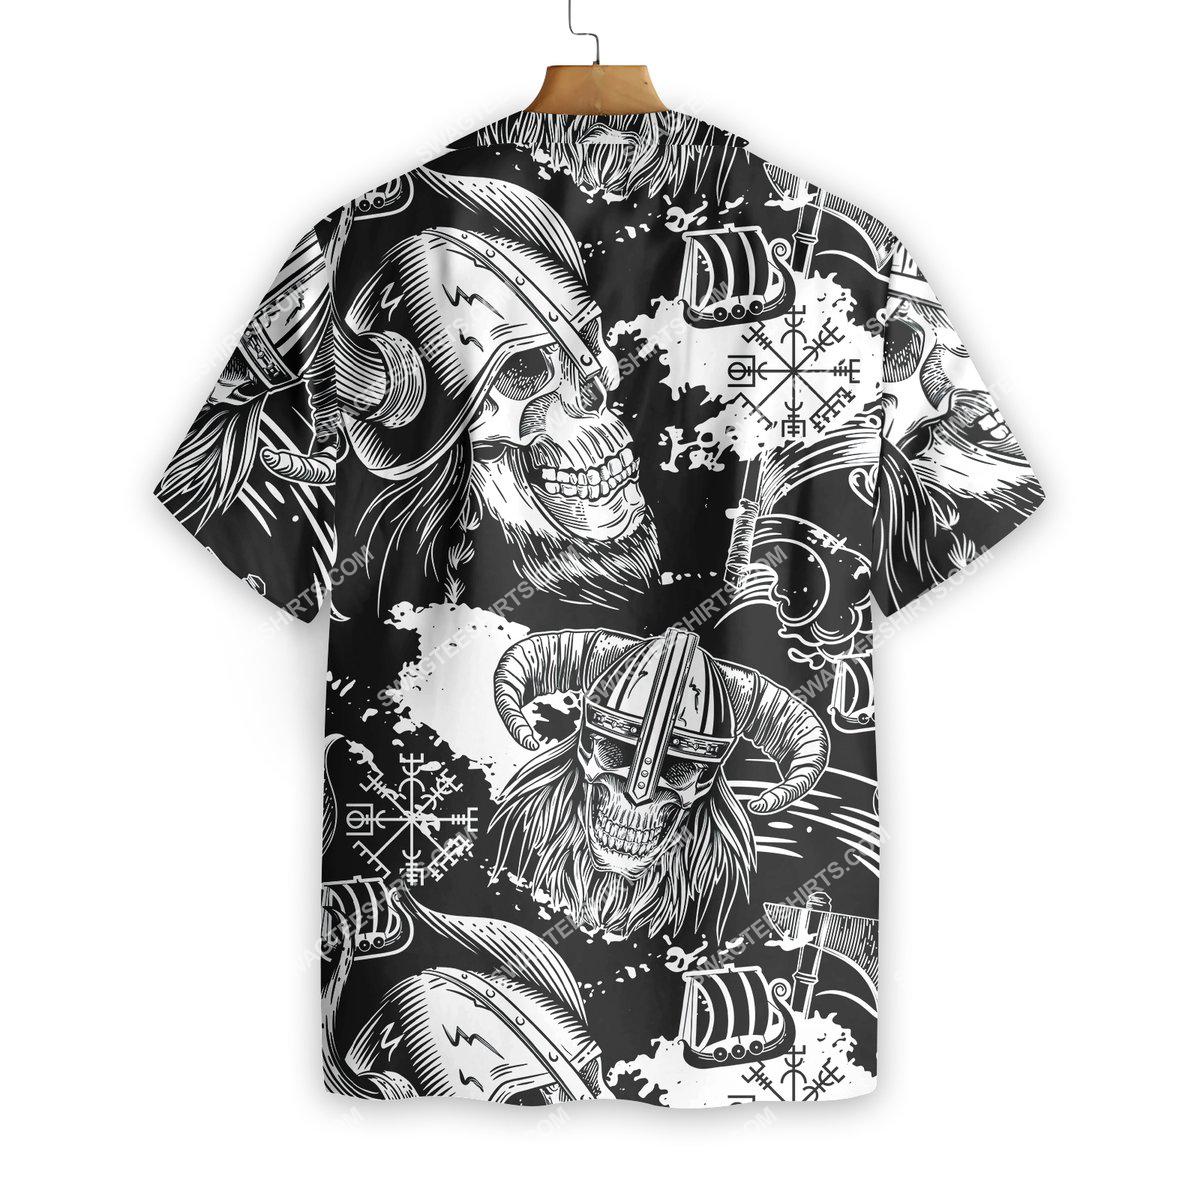 the viking warrior skull all over printed hawaiian shirt 3(1)